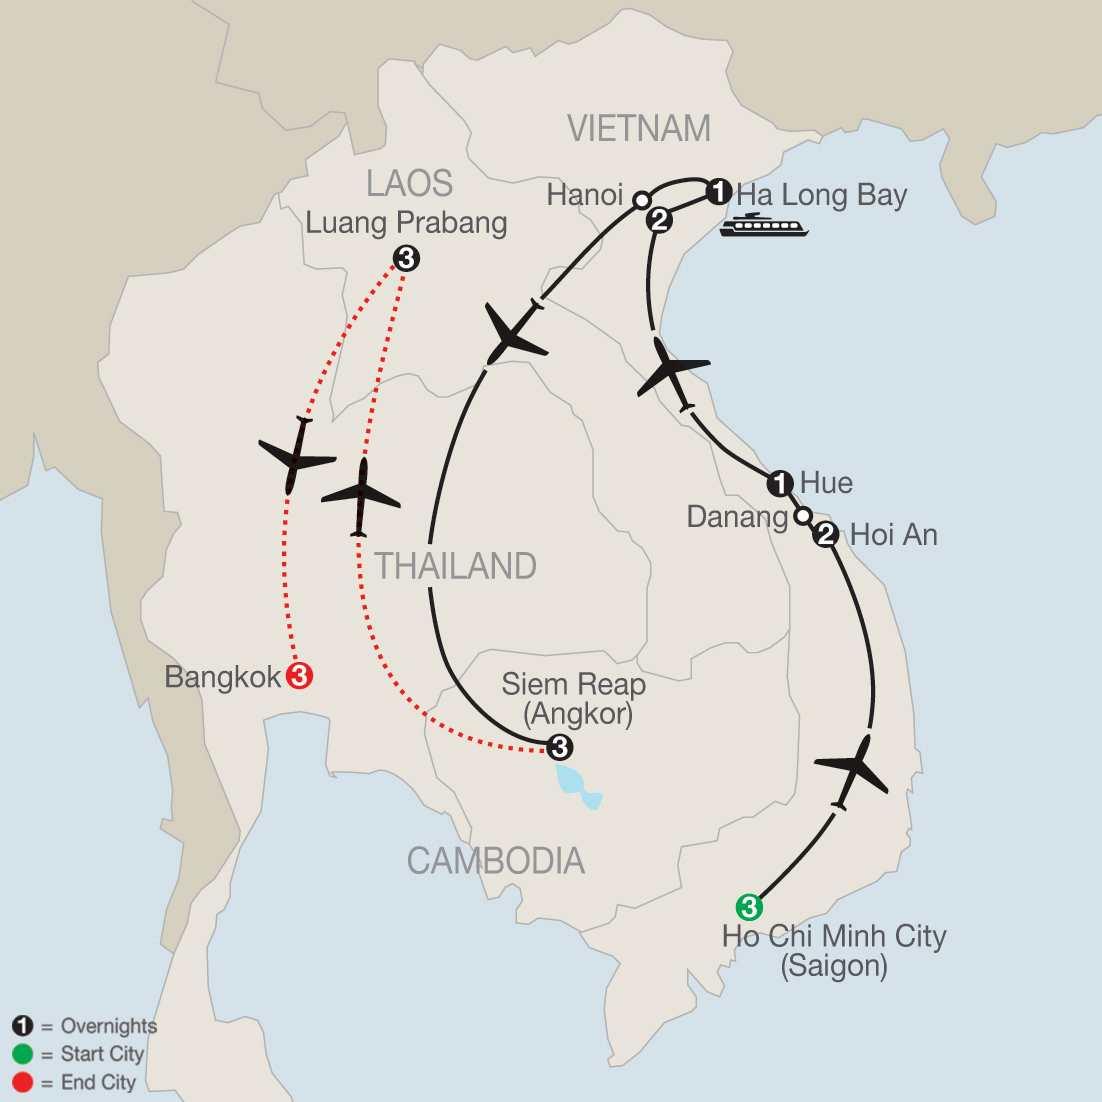 Exploring Vietnam & Cambodia with Luang Prabang & Bangkok